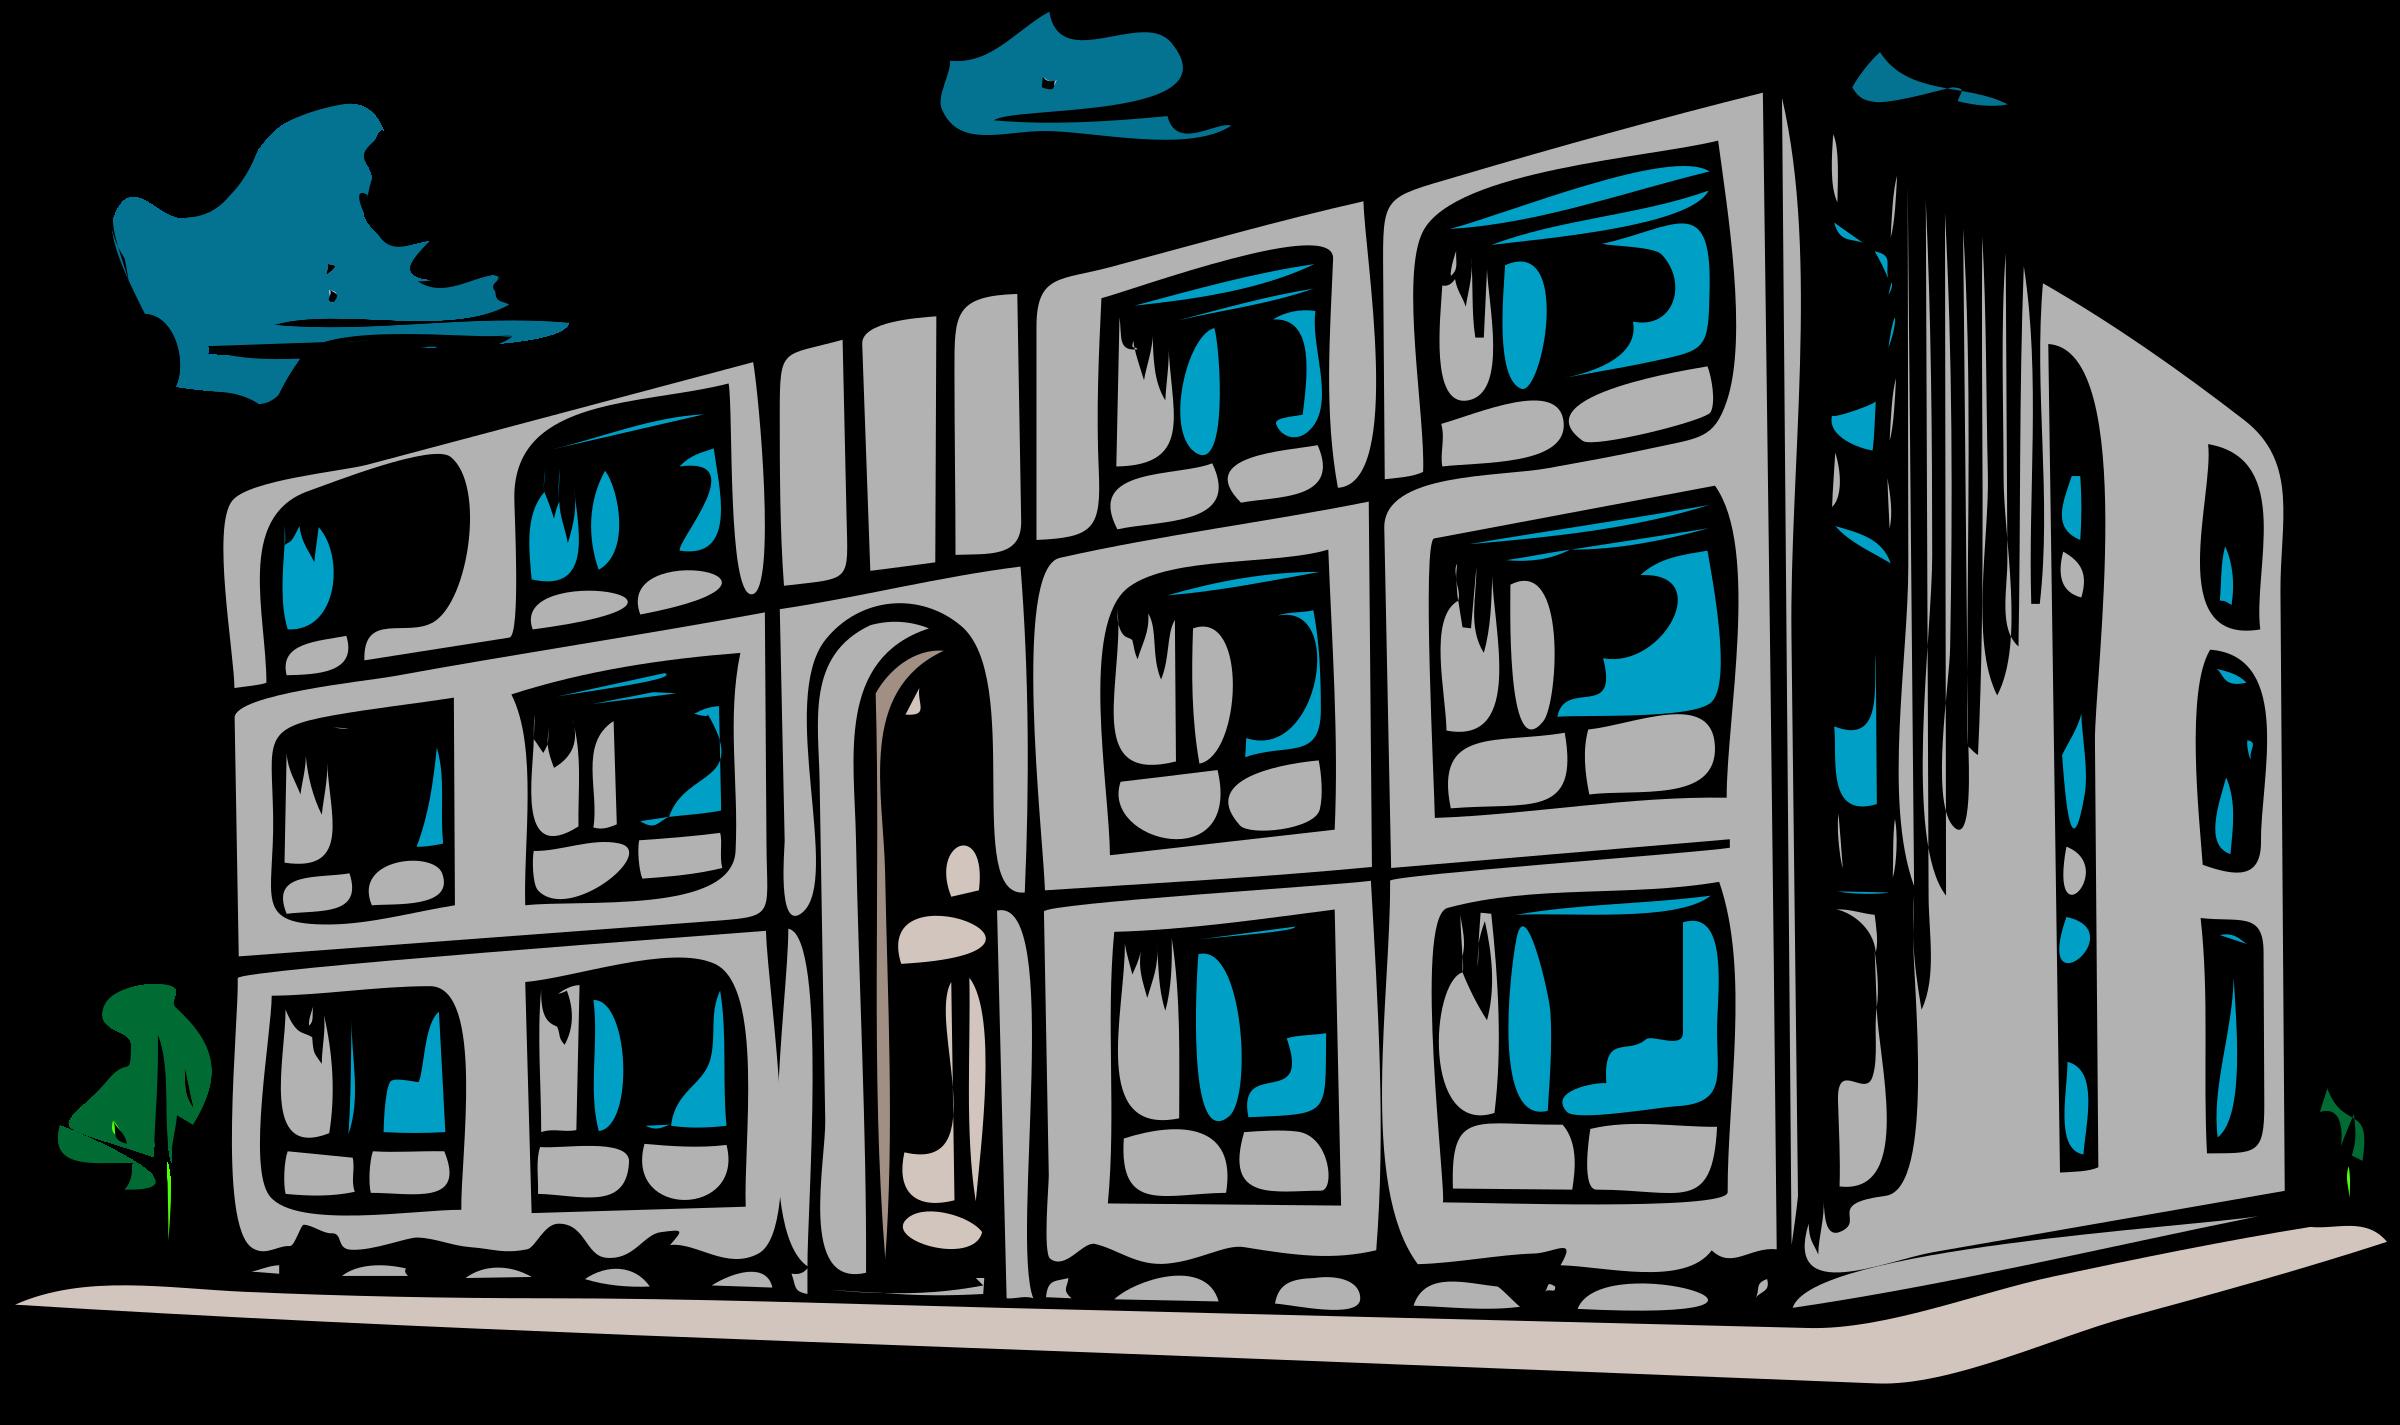 Rundown house clipart clip art royalty free stock Clipart - Architetto -- Condominio clip art royalty free stock